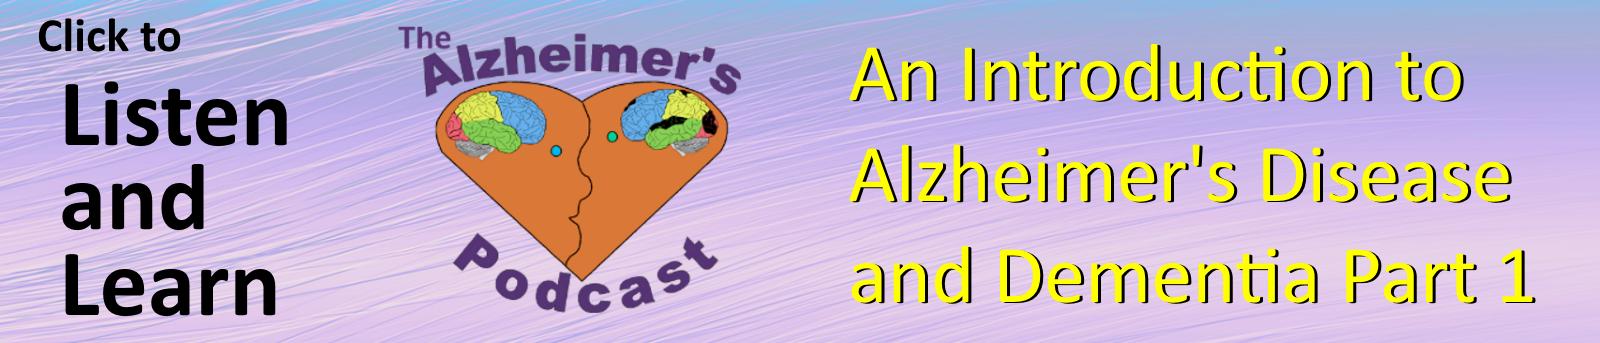 Episode 7 of The Alzheimer's Podcast